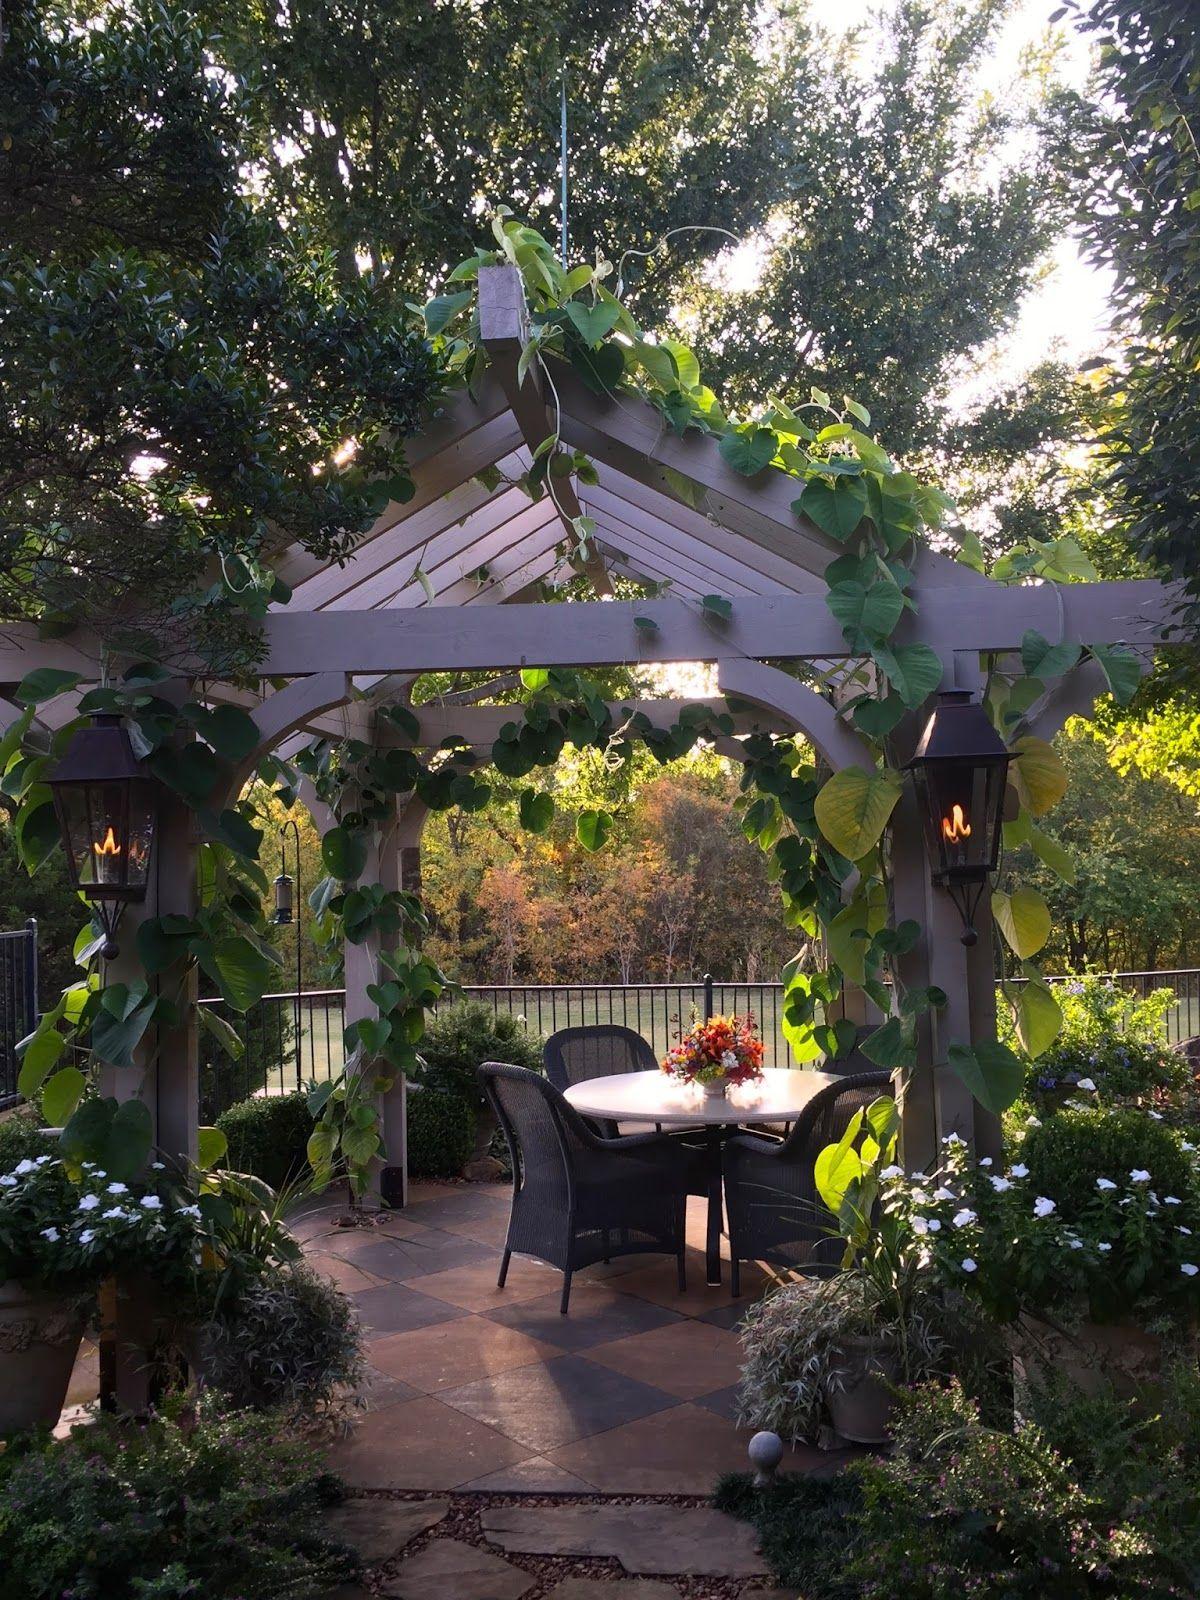 P O T A G E R: 5 Great Garden Ideas To Steal